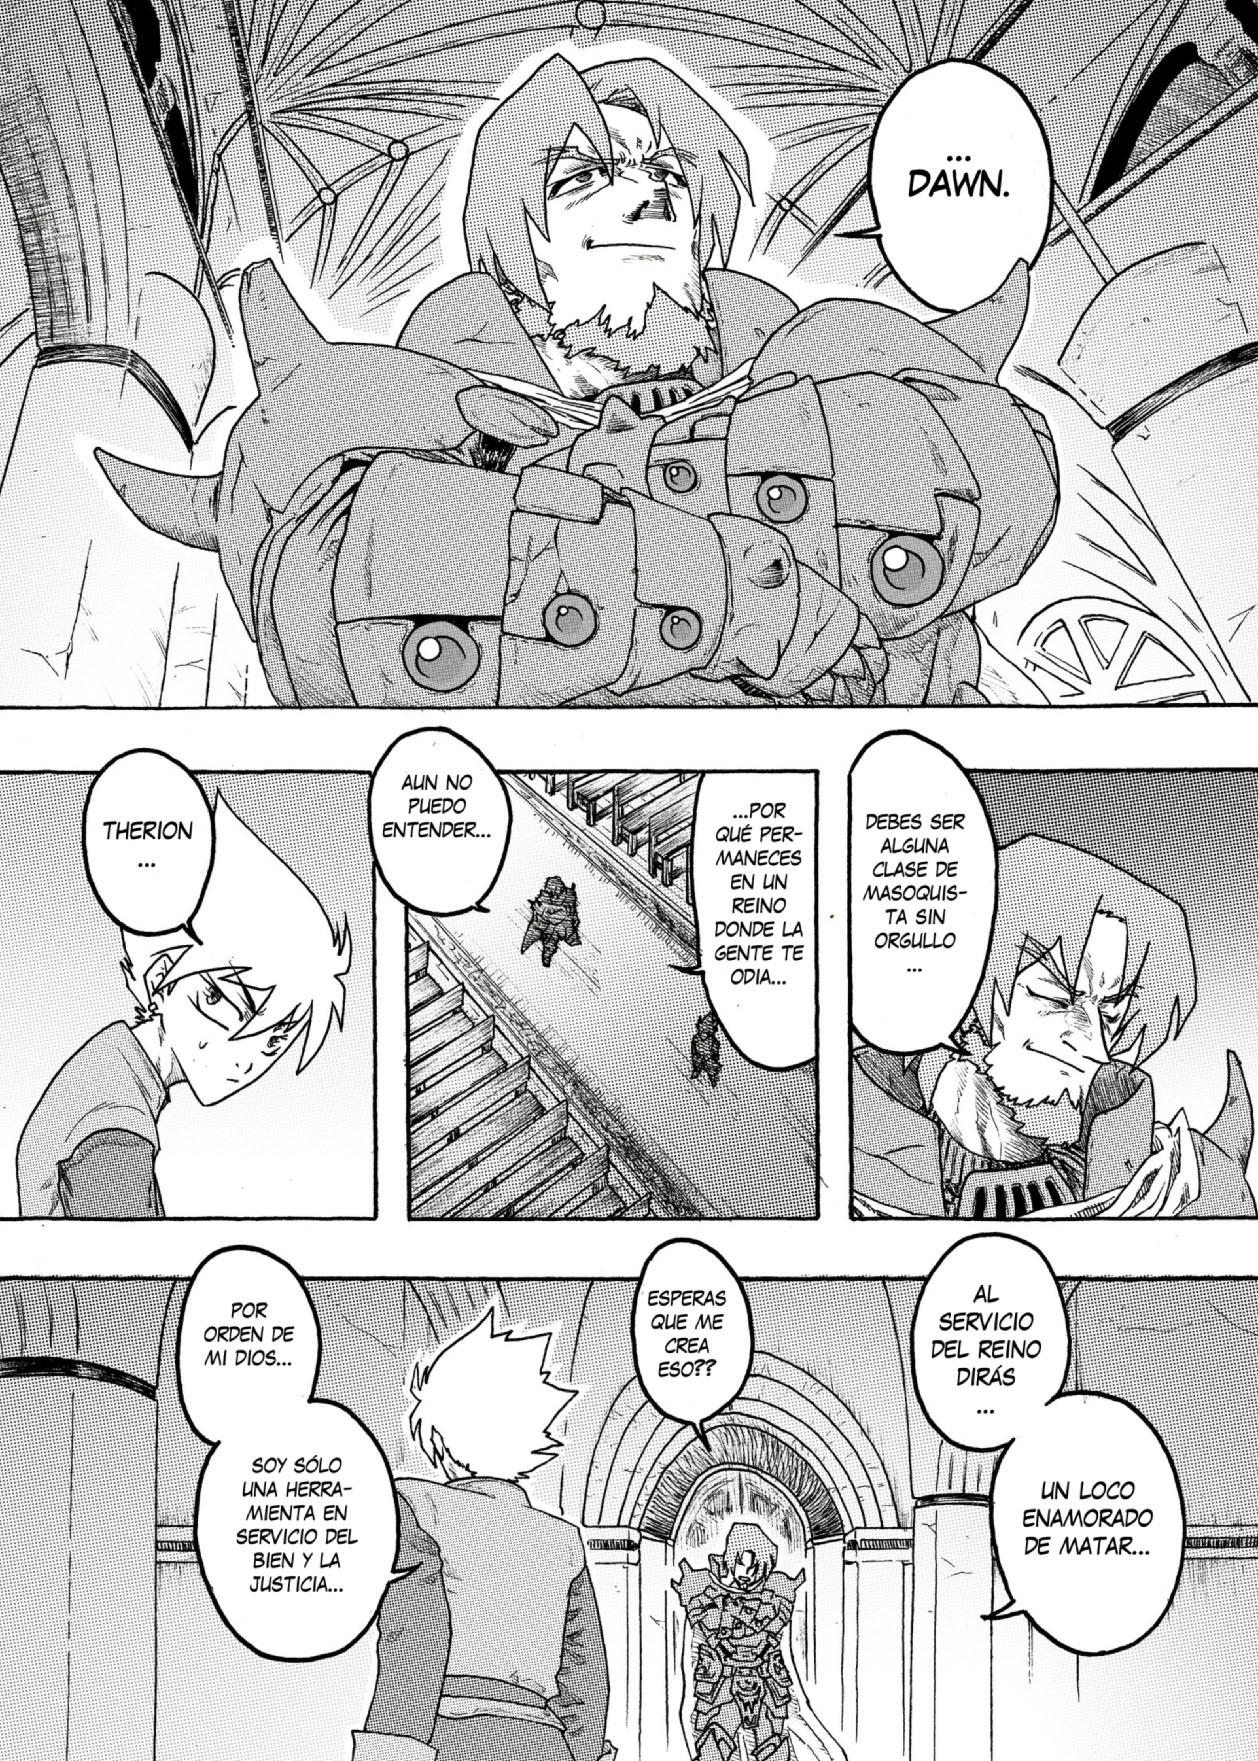 Dawn-page-15